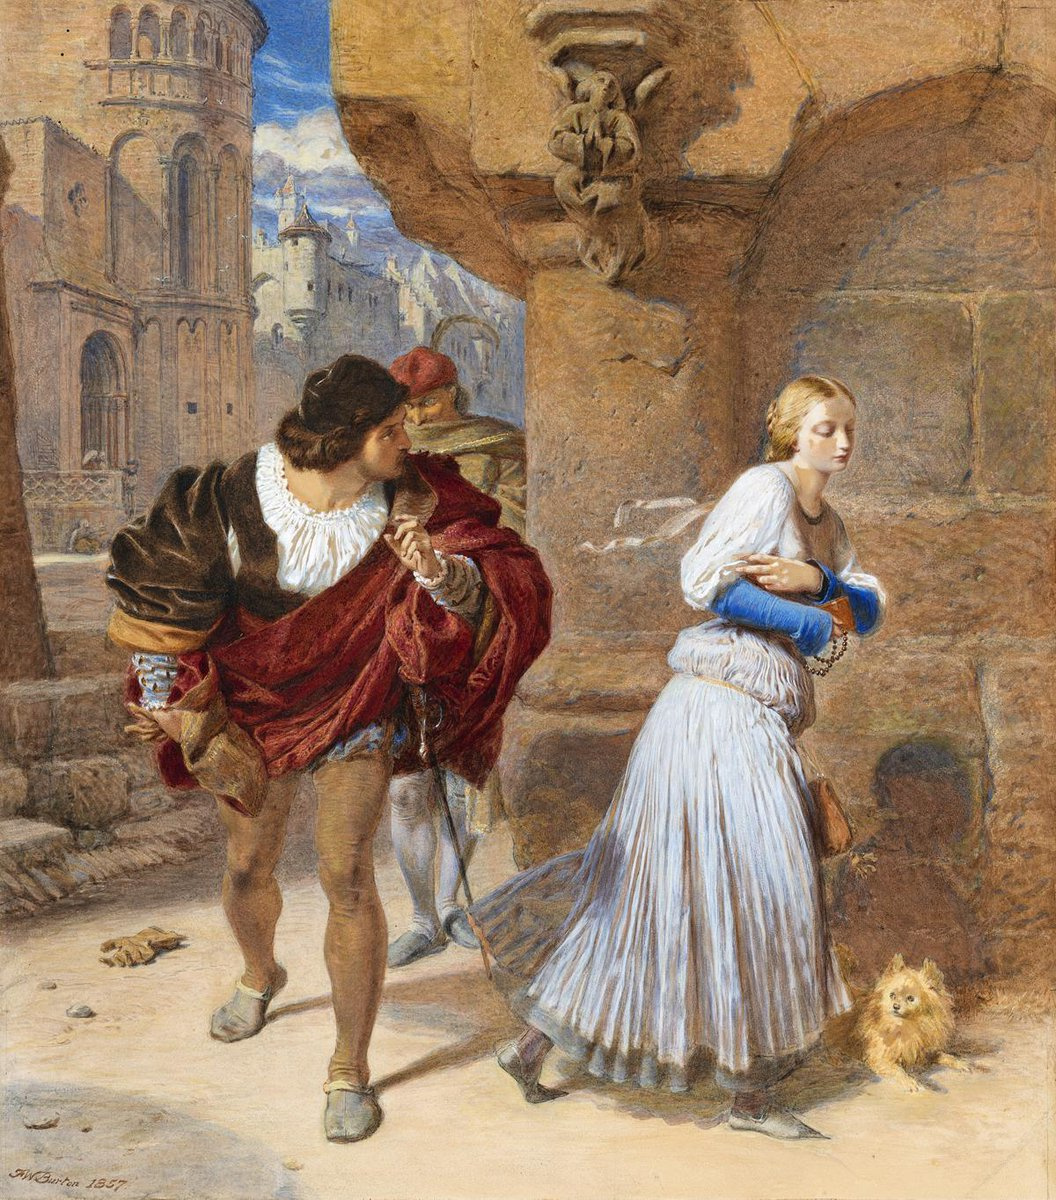 Frederick William Burton. Faust's first look at Margarita